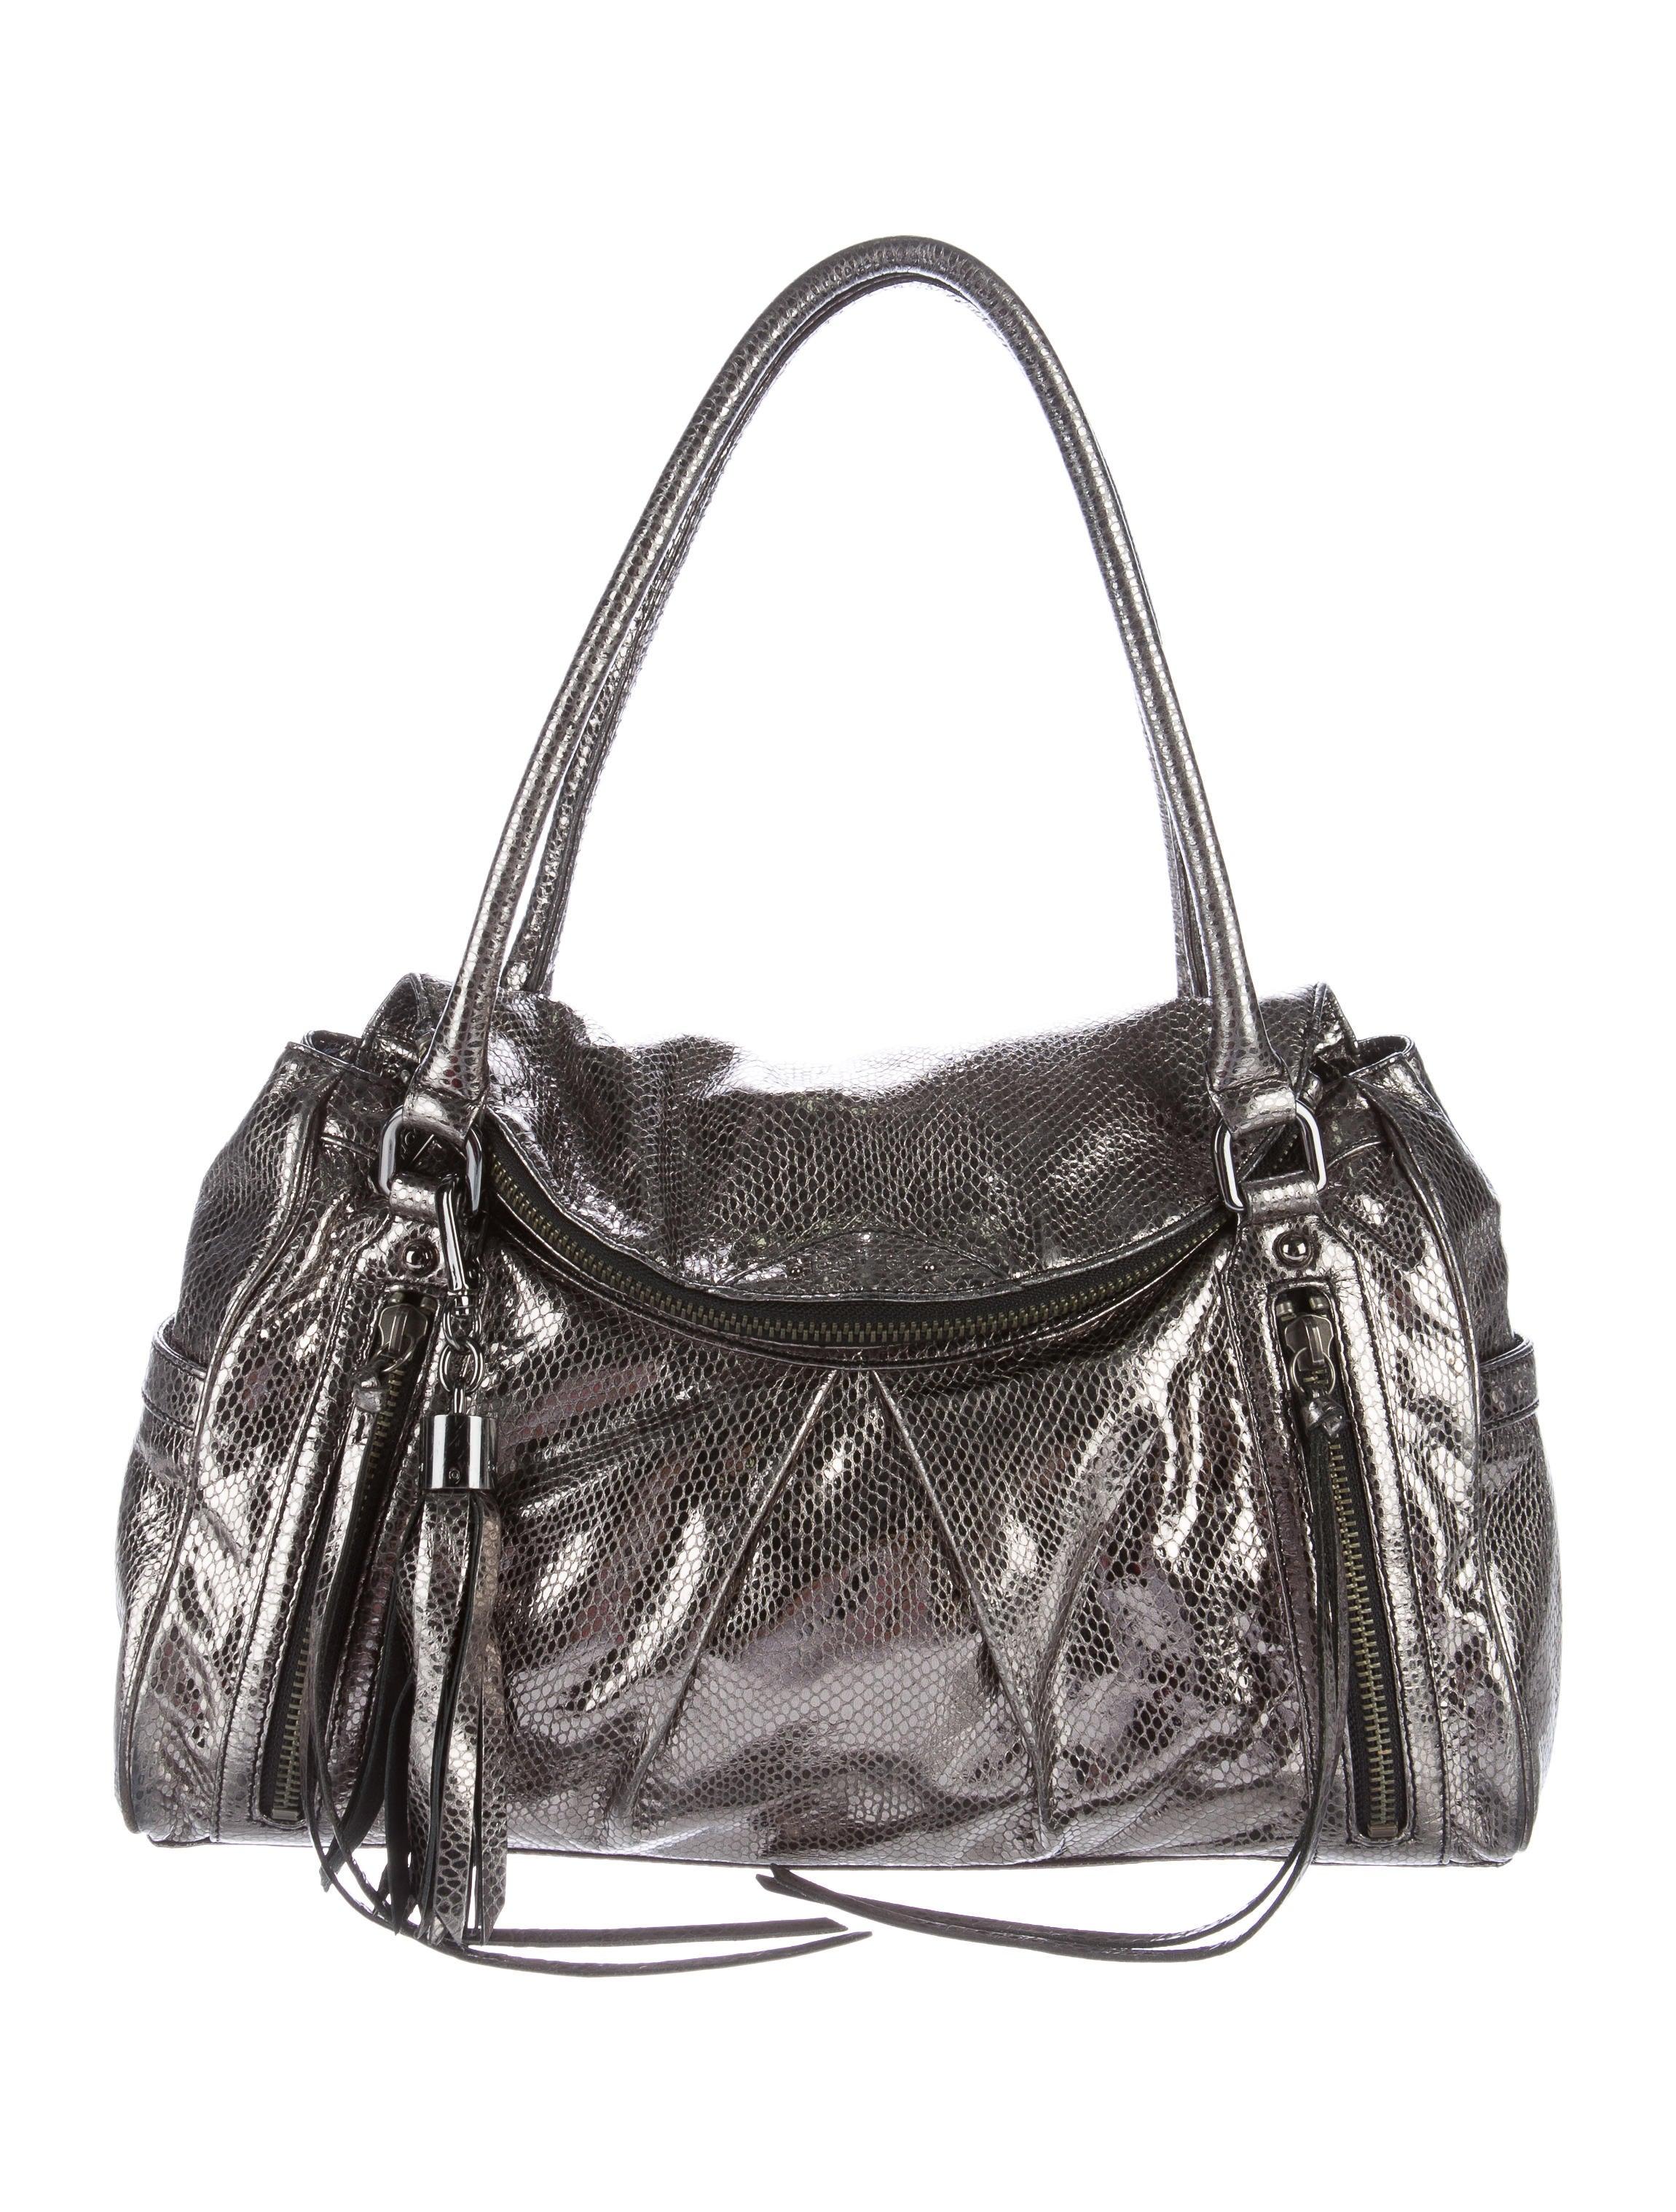 Botkier Metallic Shoulder Bag - Handbags